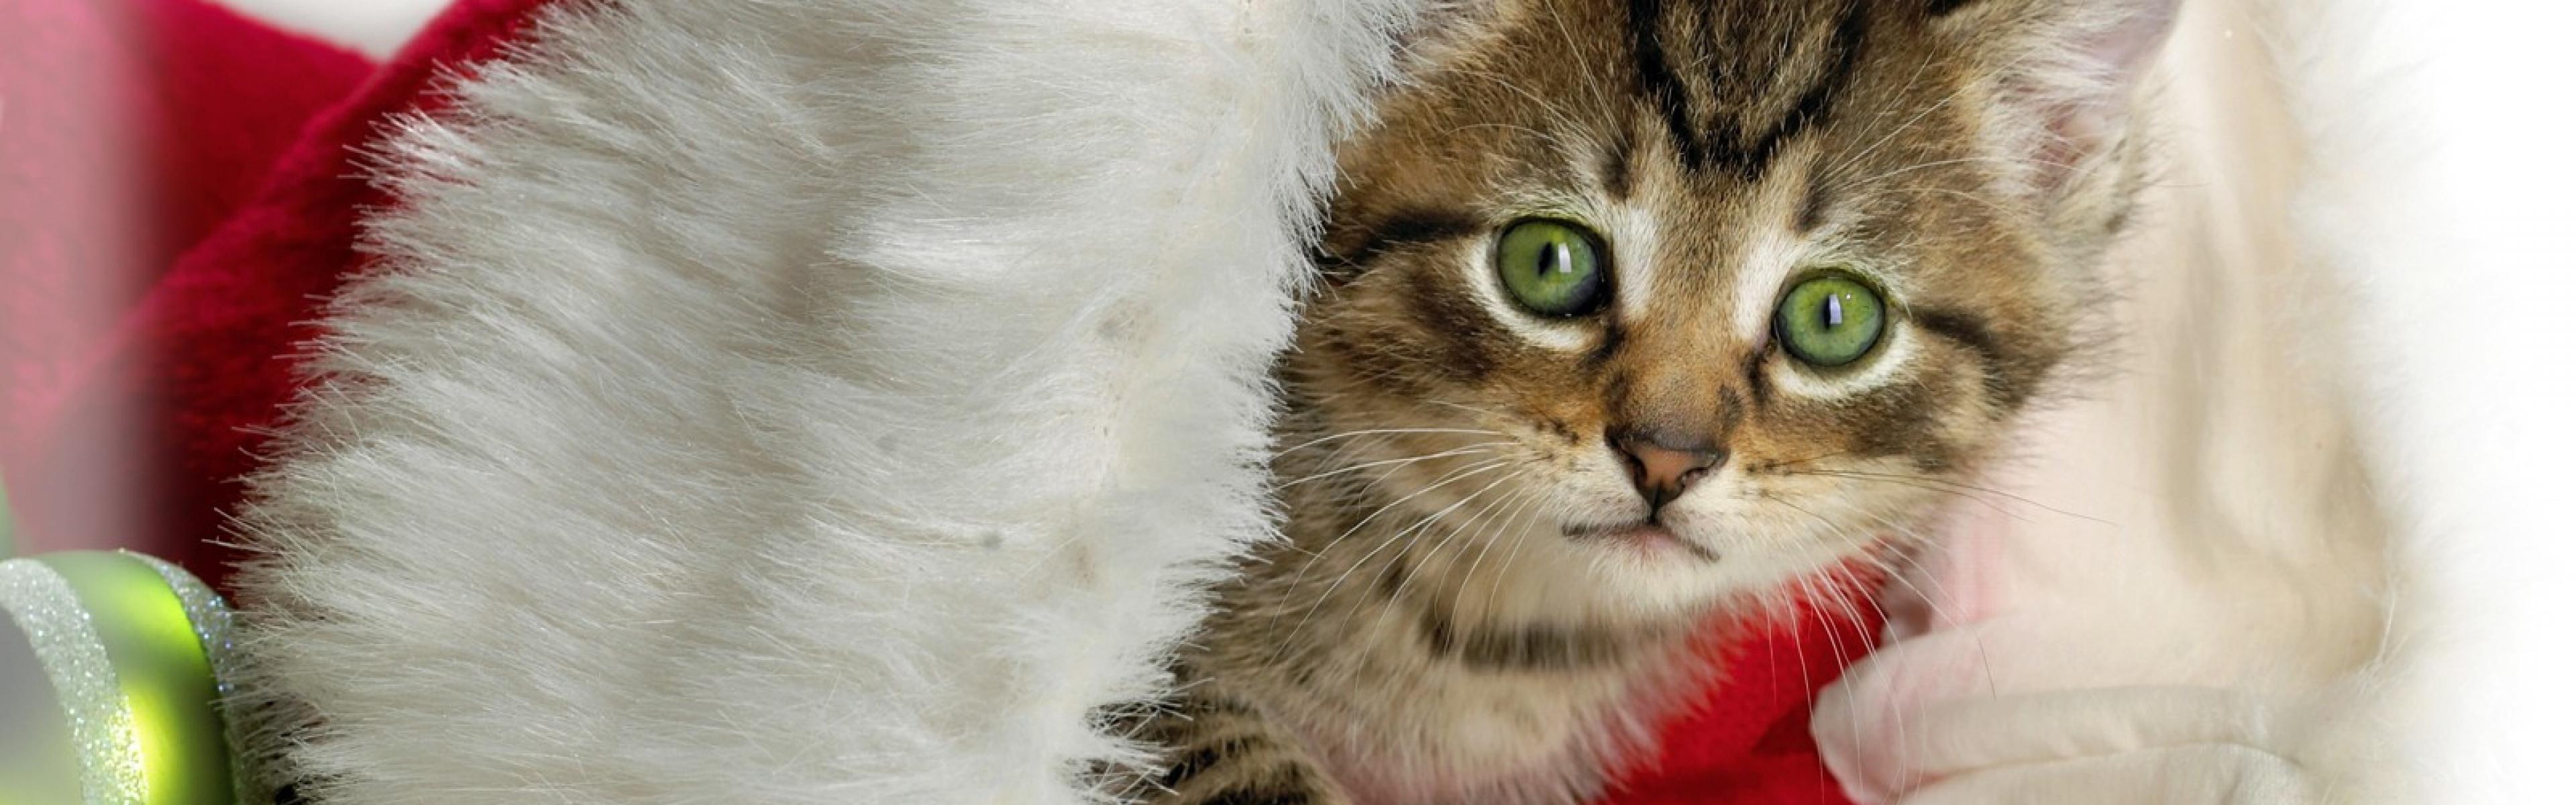 Christmas Kitten Wallpaper Page 1